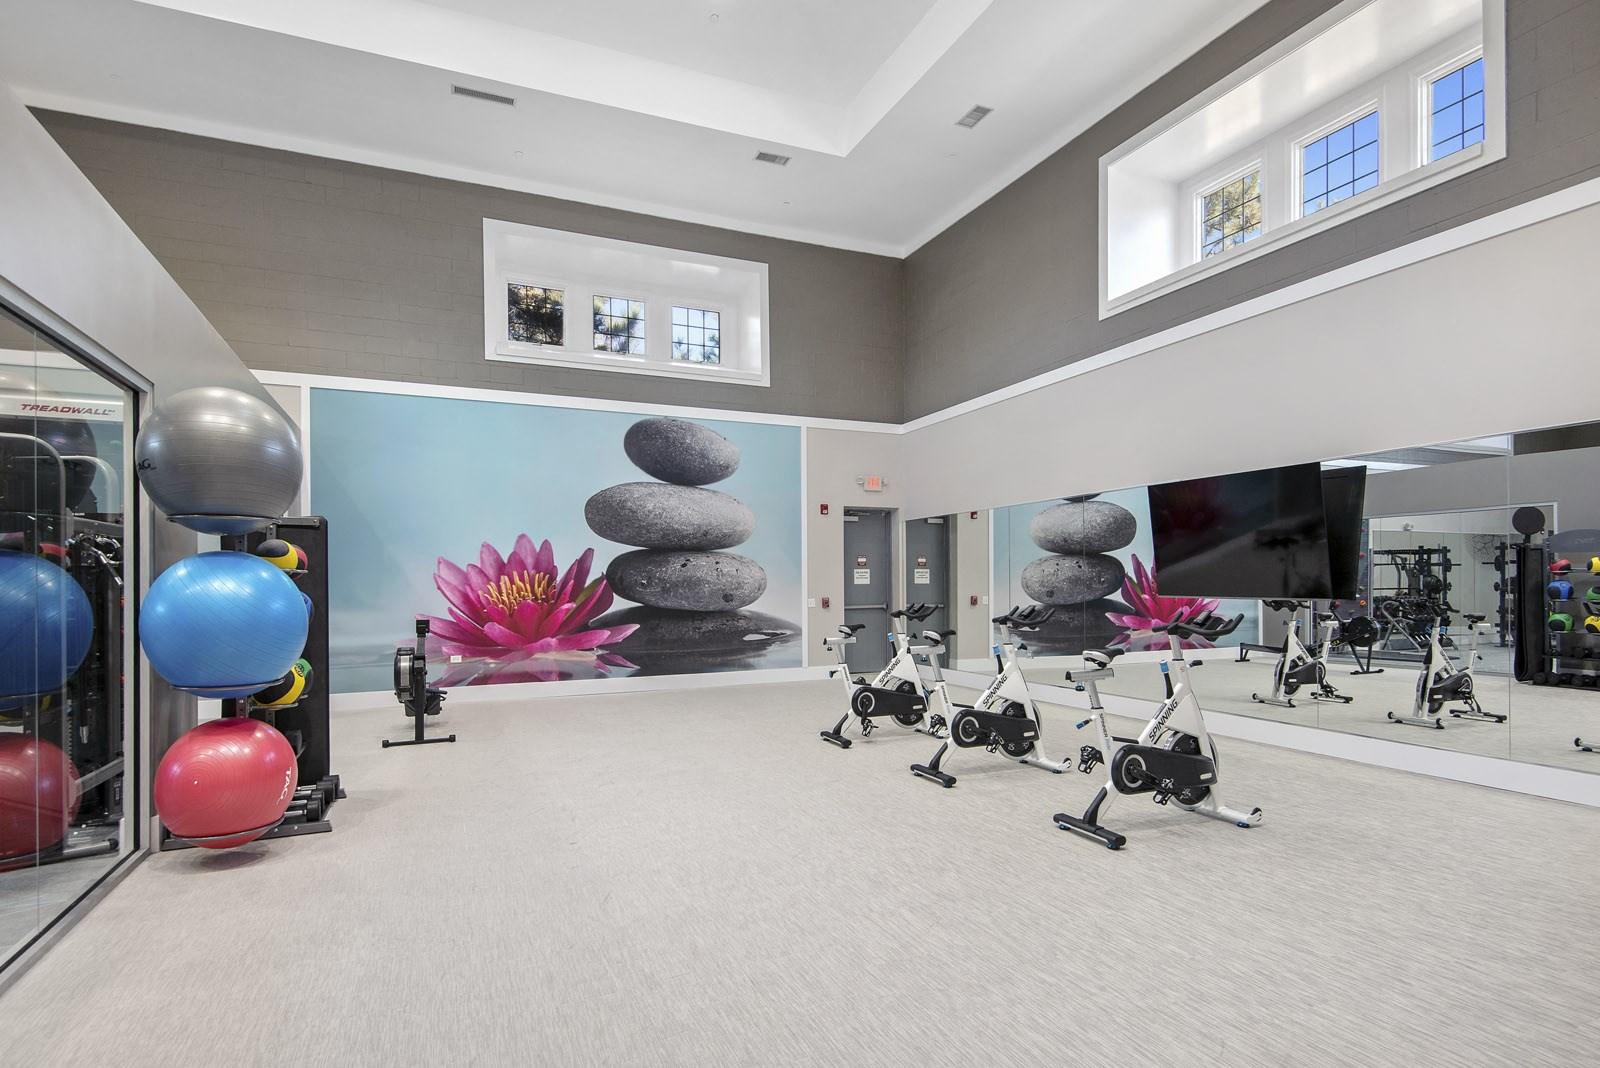 Yoga and fitness studio